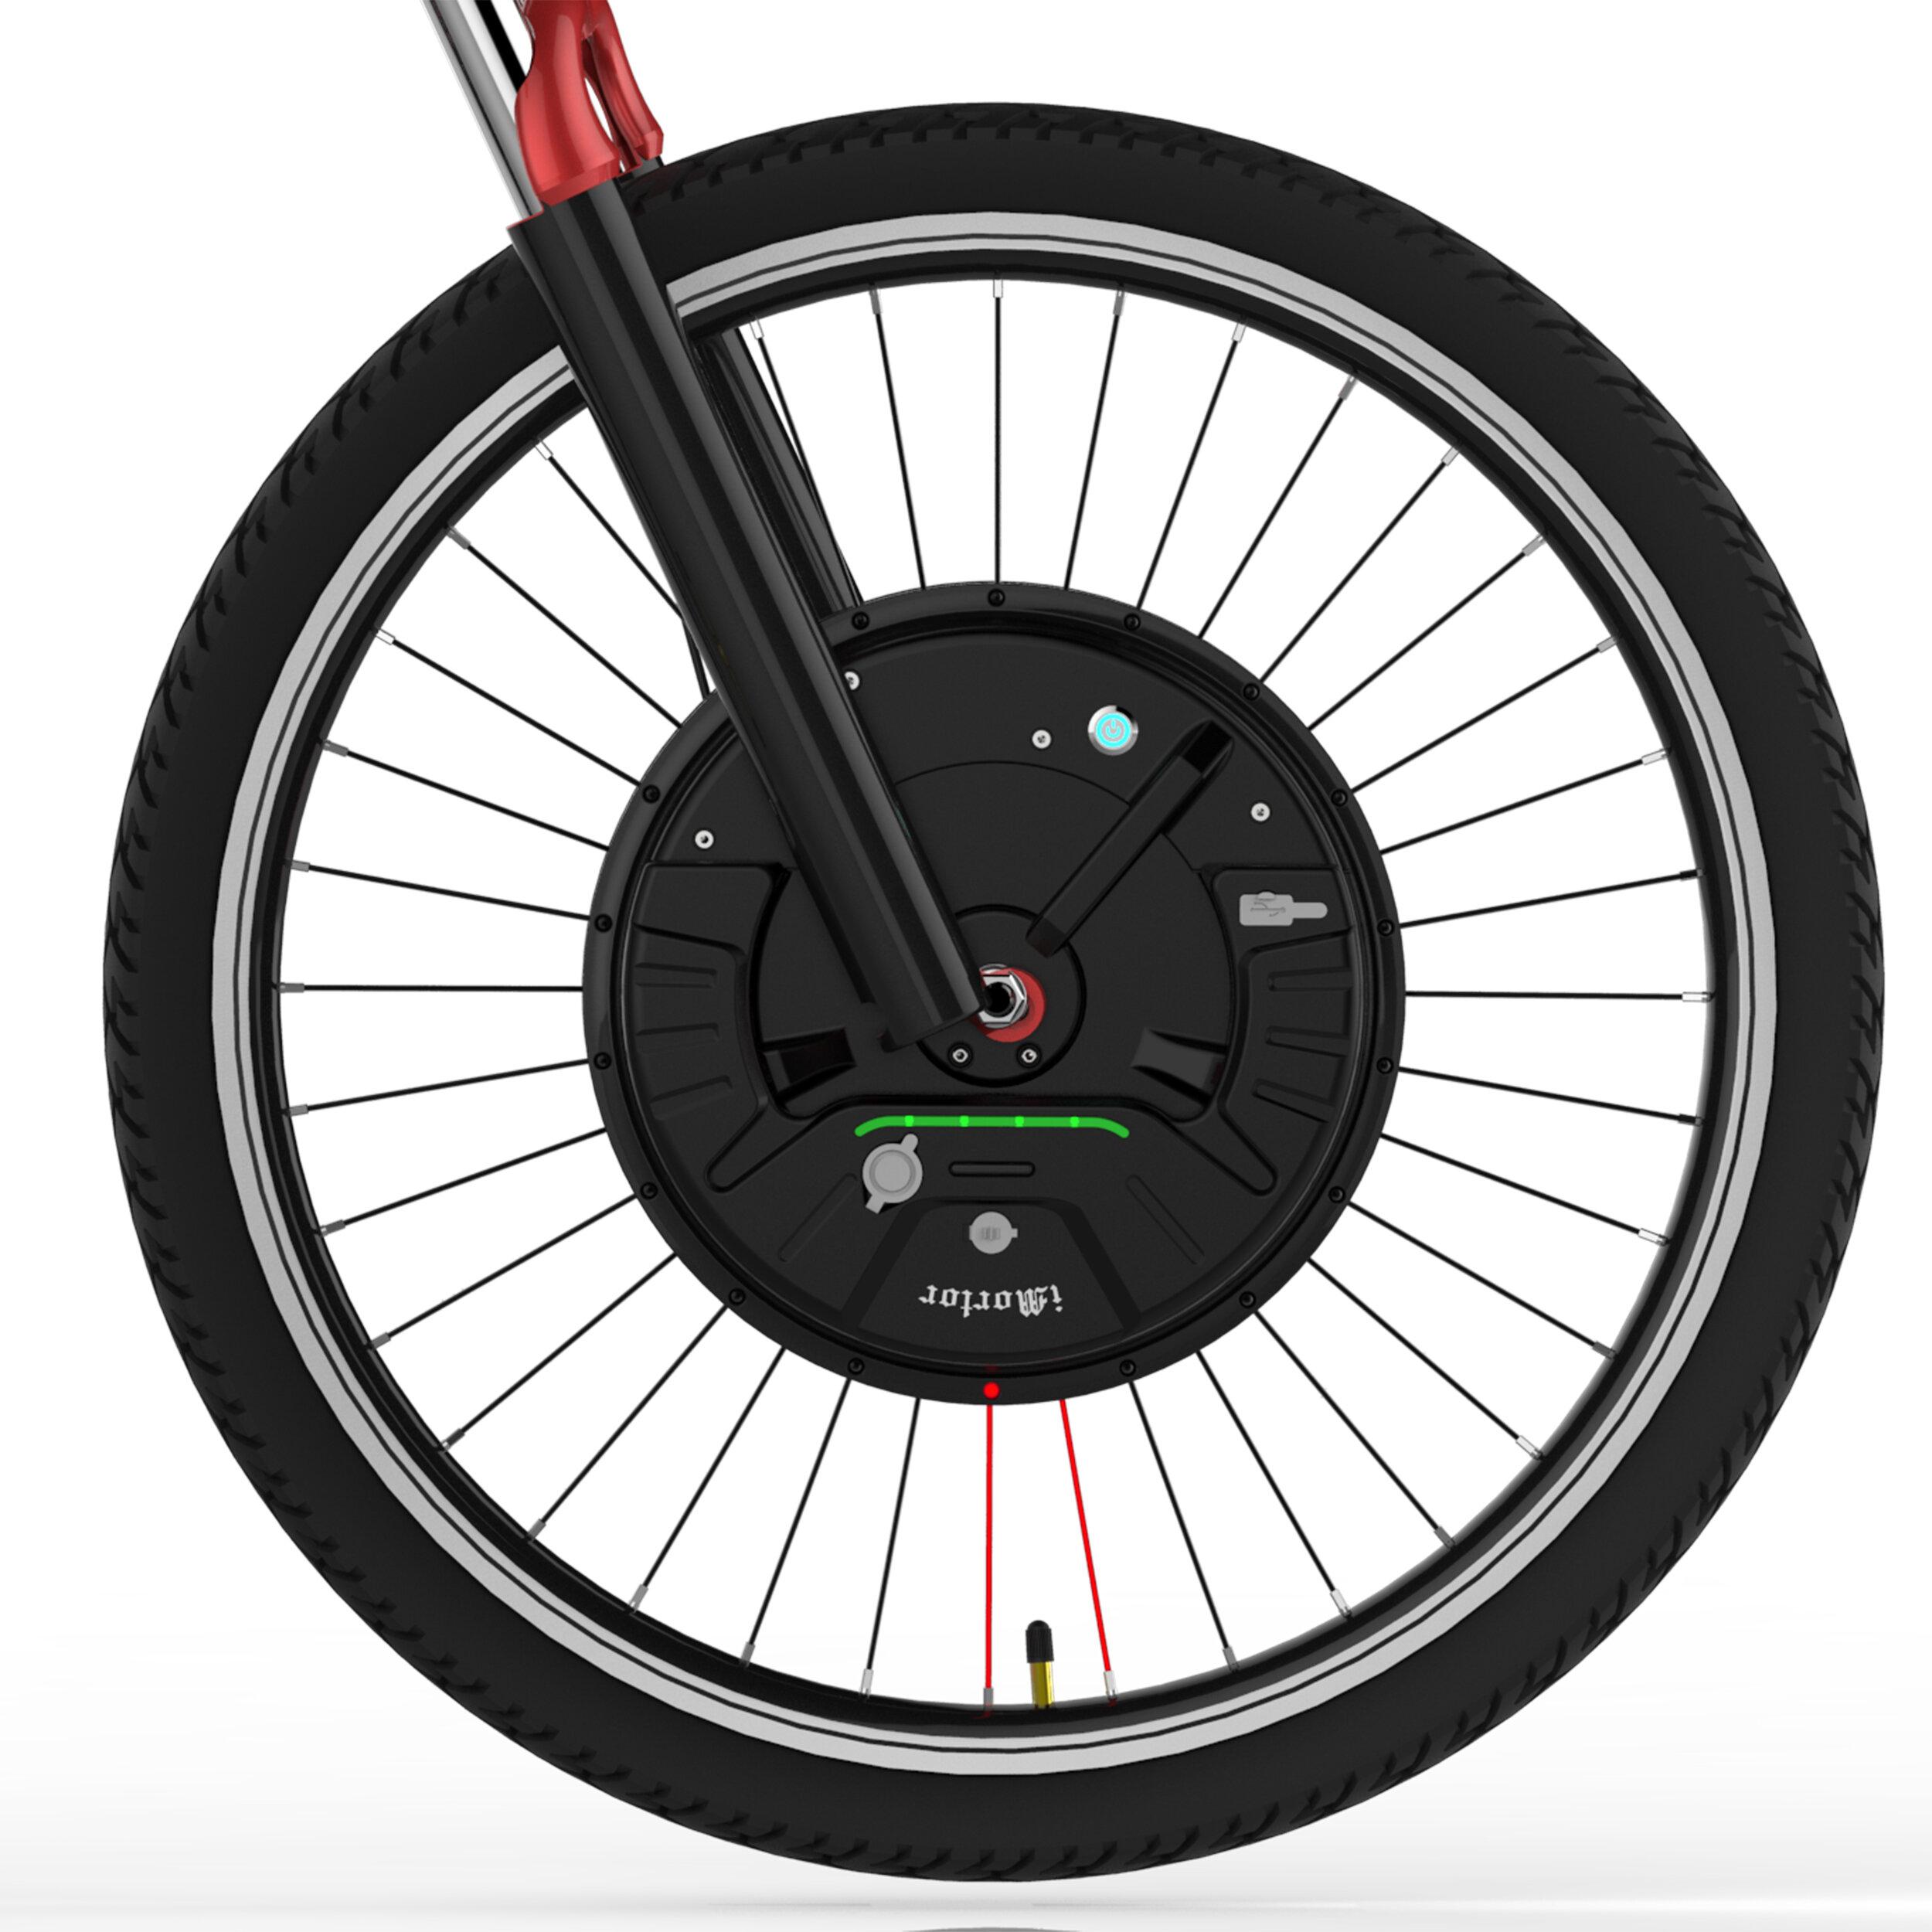 iMortor 3.0 Full Wireless 26in/700C 350W 24V Brushless Motor Intelligence Bicycle Front Wheel